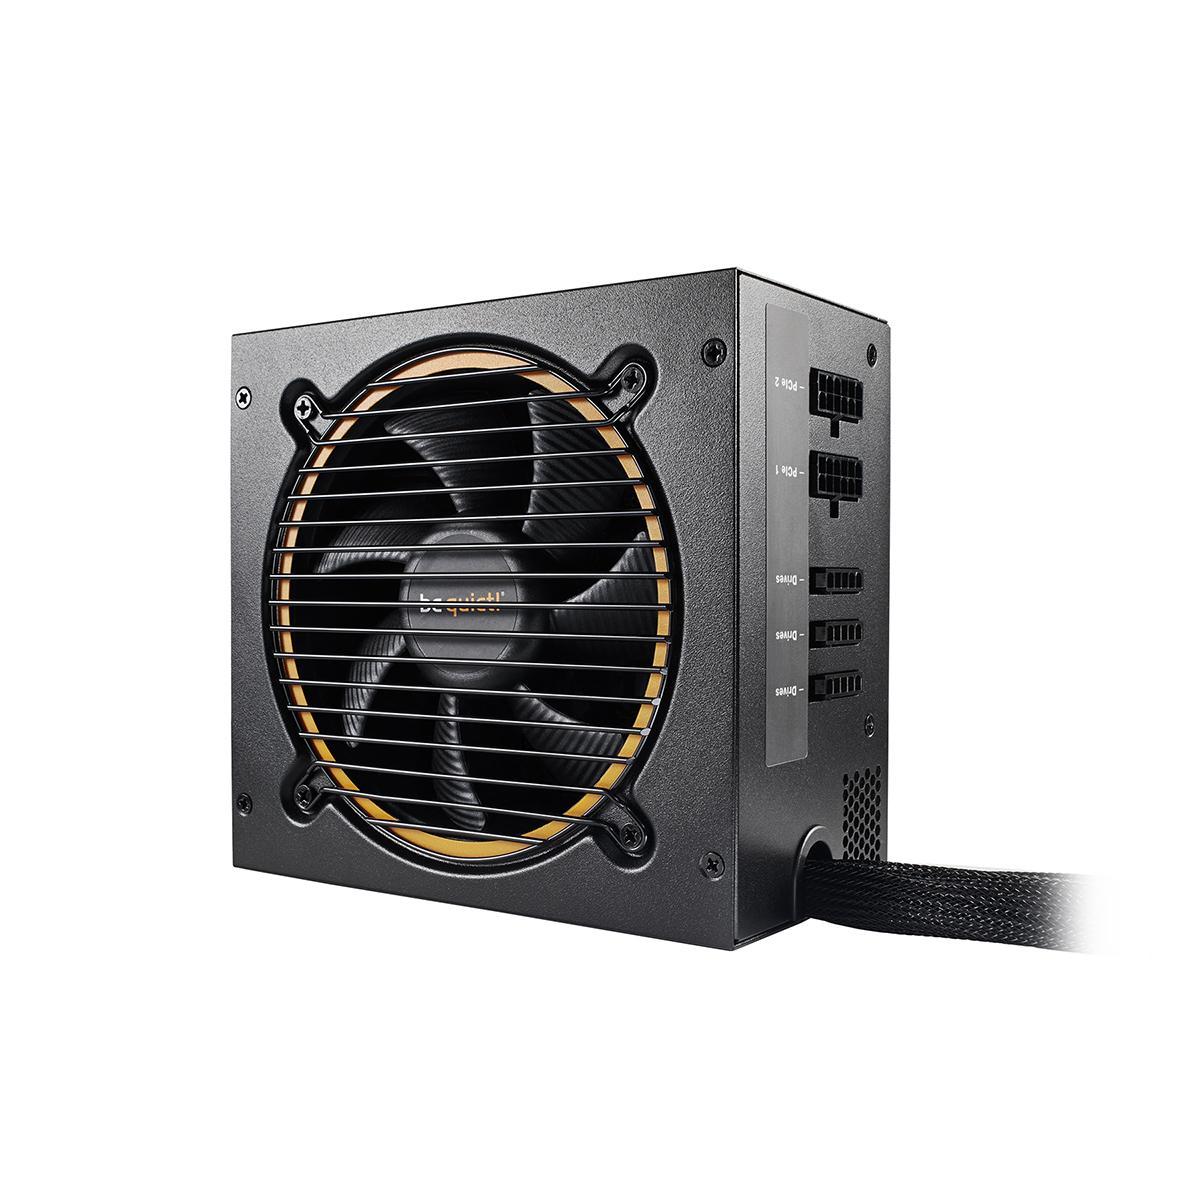 be quiet! Pure Power 11 CM 700 W 80+ Gold Certified Semi-modular ATX Power Supply